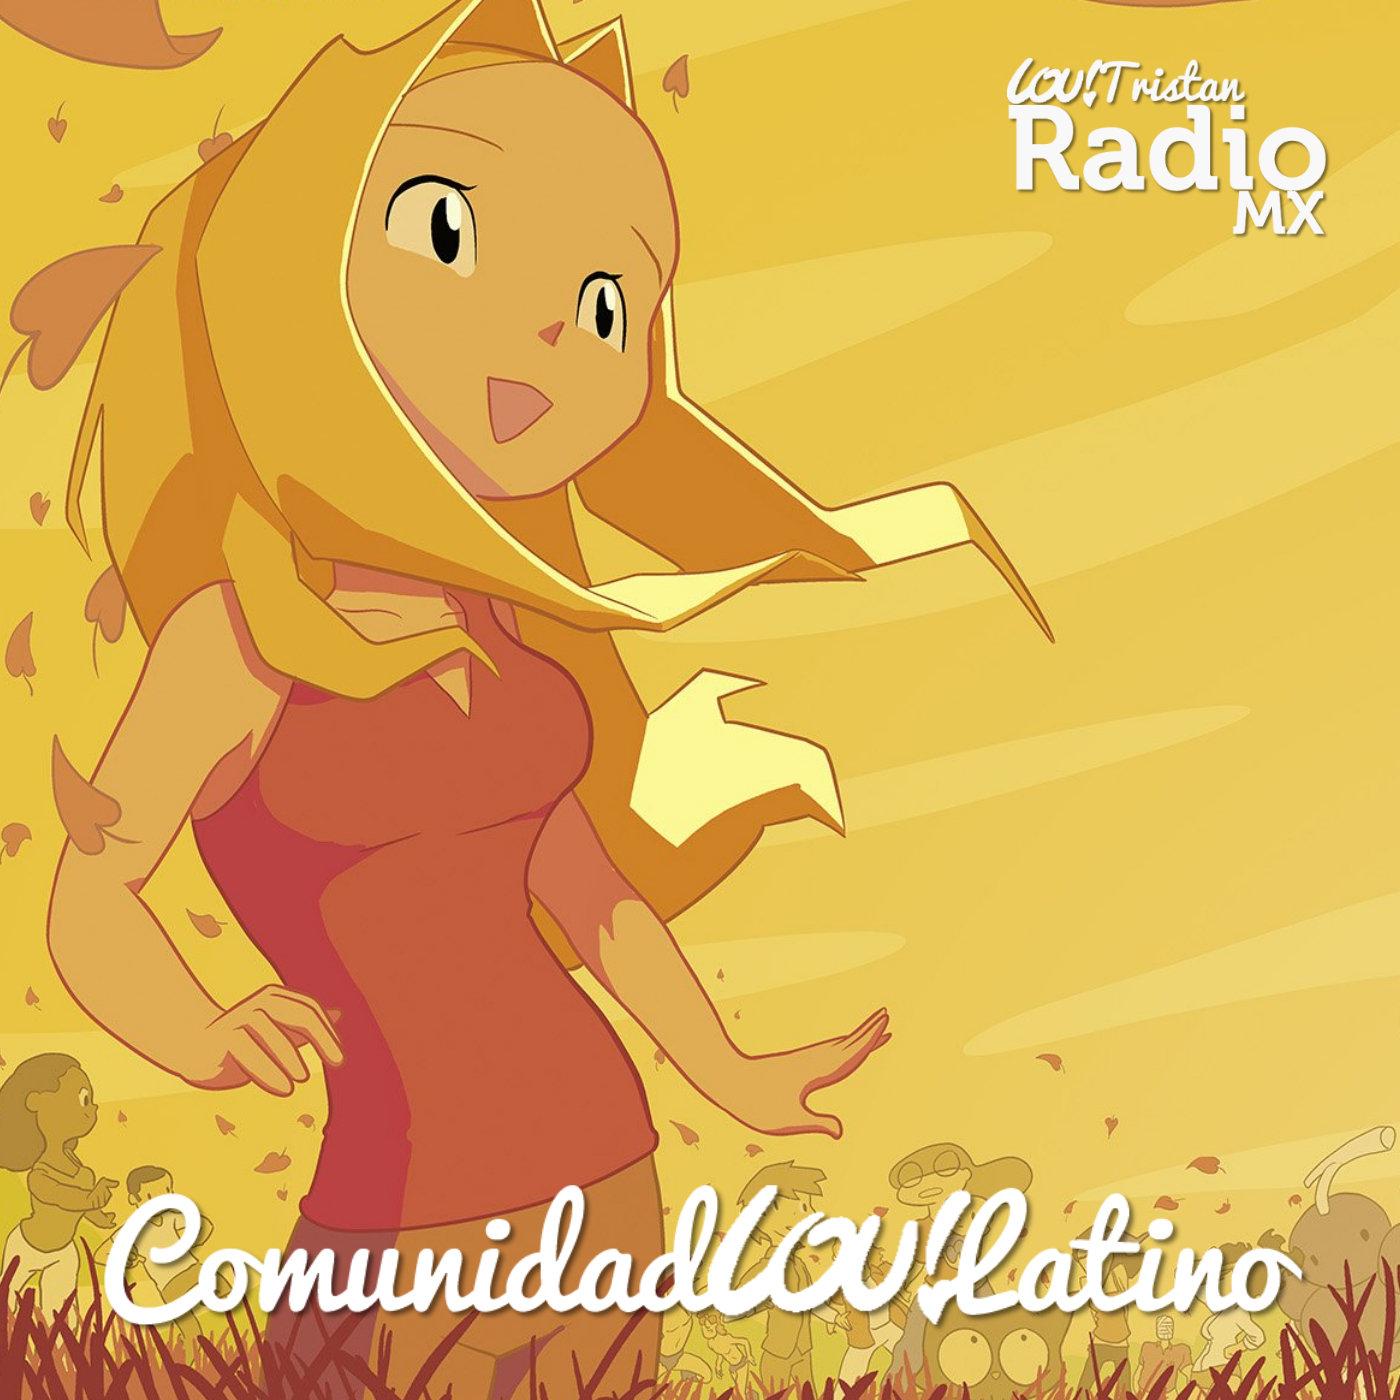 <![CDATA[Comunidad LOU! Latino]]>